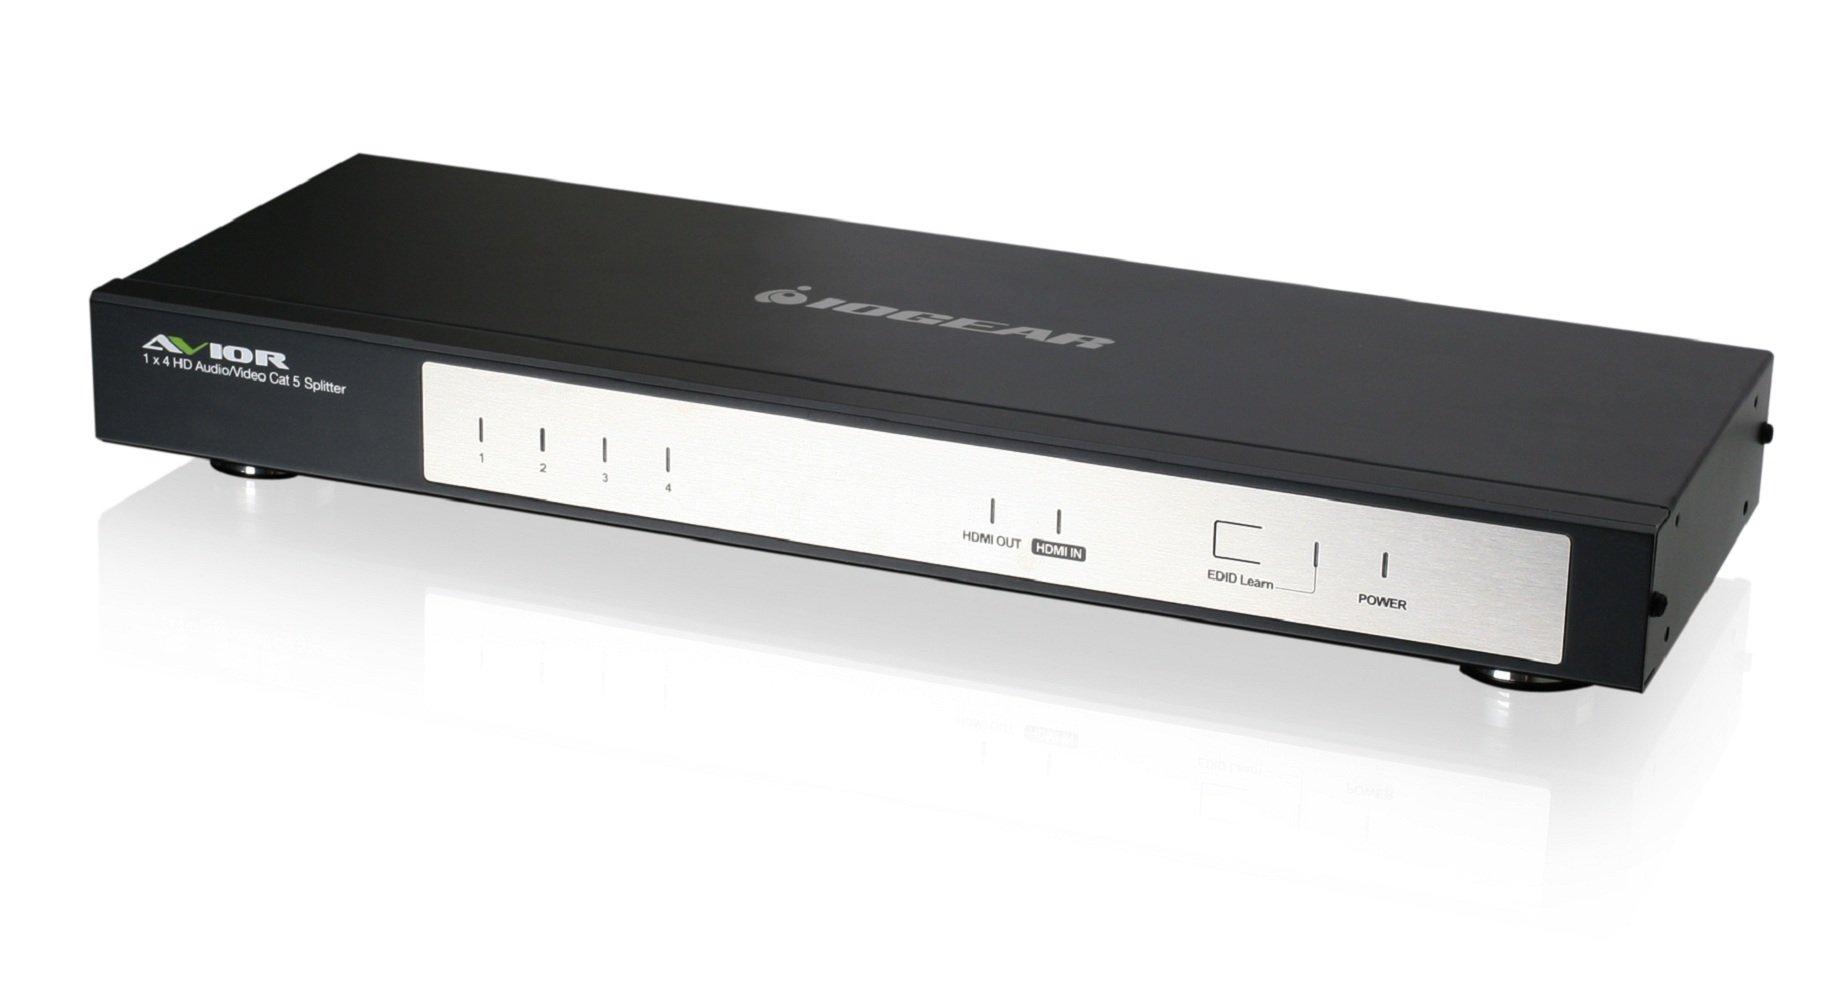 IOGEAR 4-Port HDMI Audio/Video Cat 5e/6 Splitter (GHSP8214E)